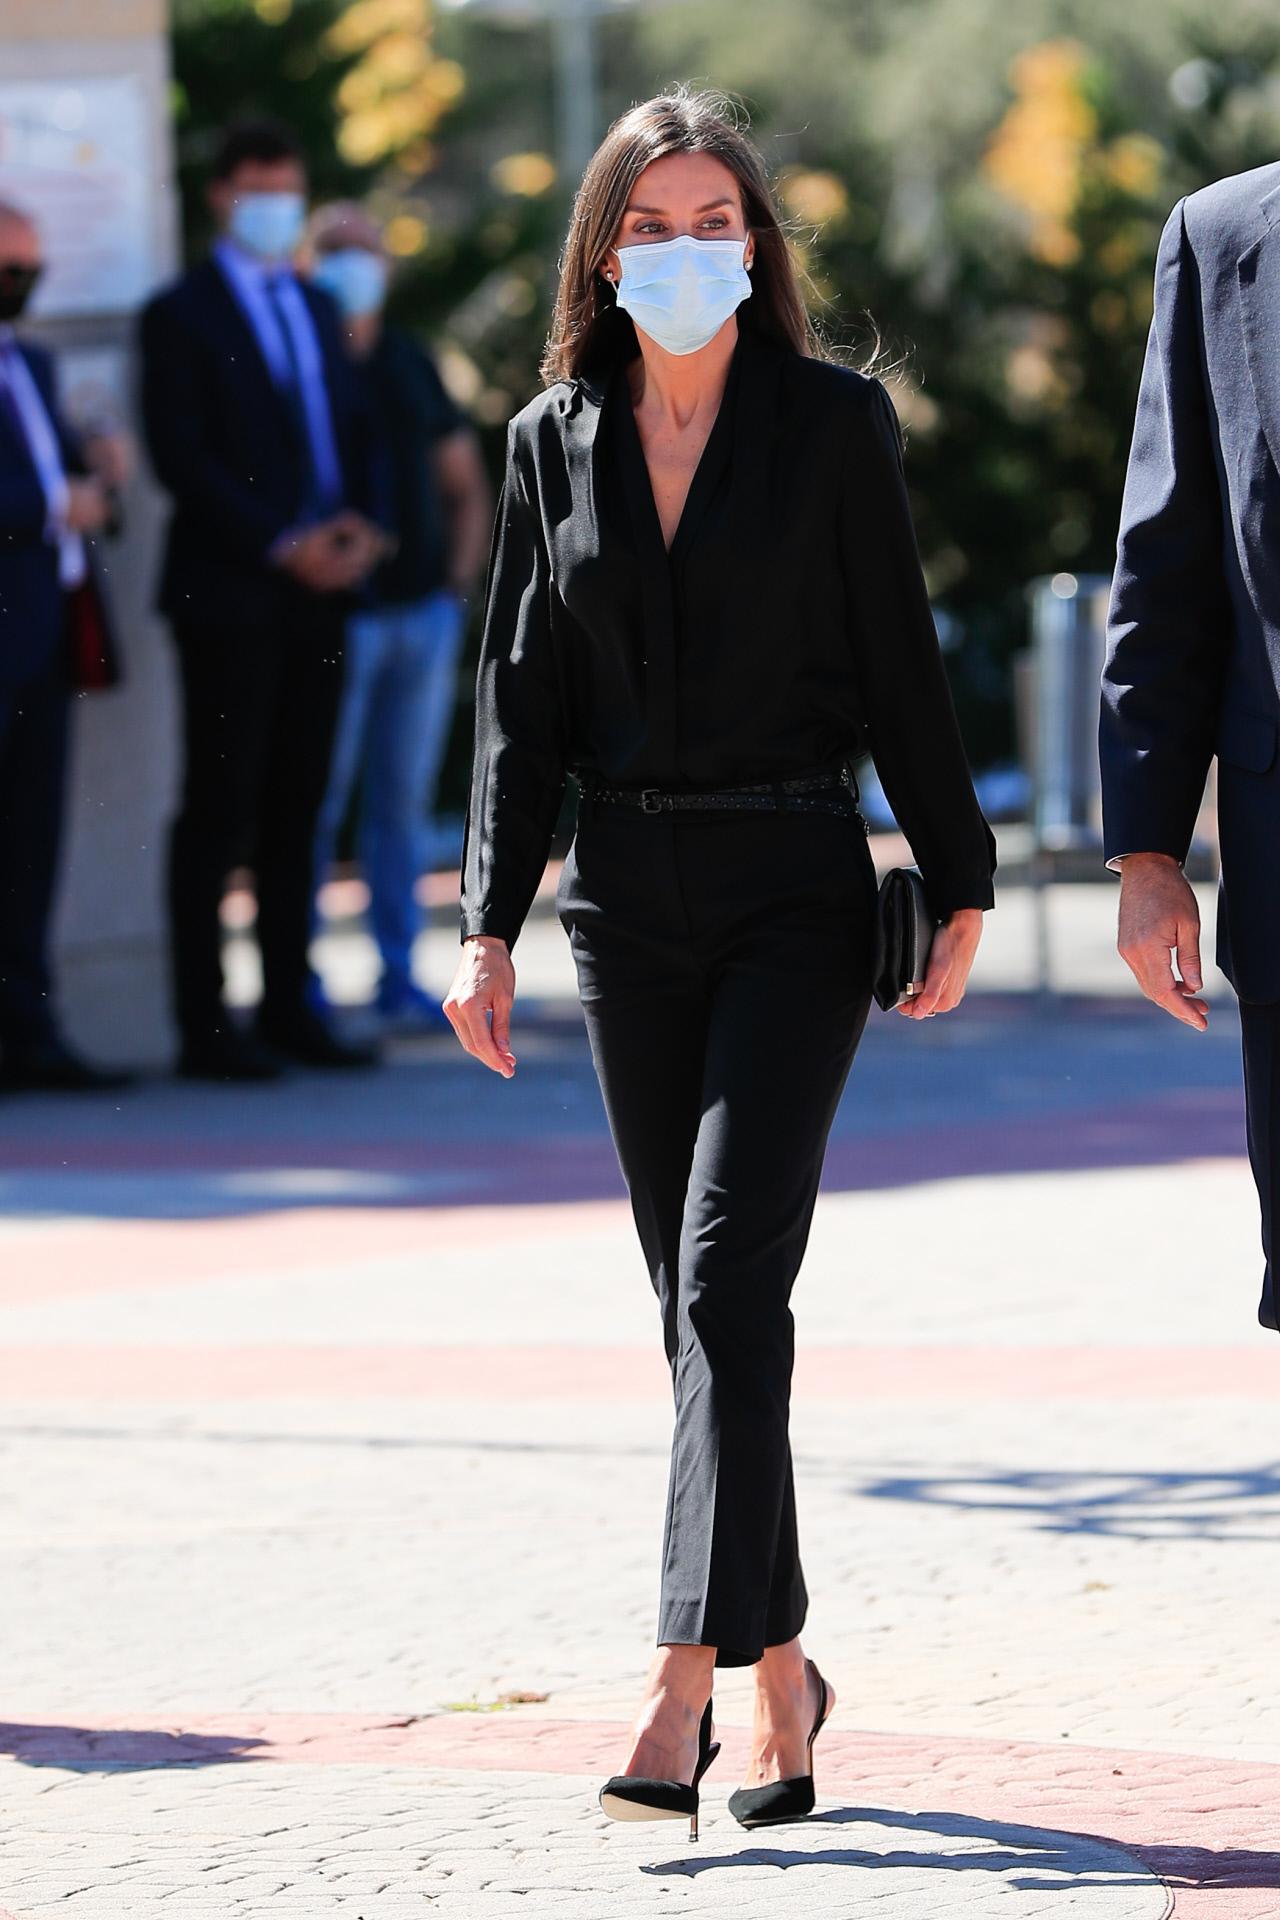 La reina Letizia acude al tanatorio para despedir a Jaime Carvajal...